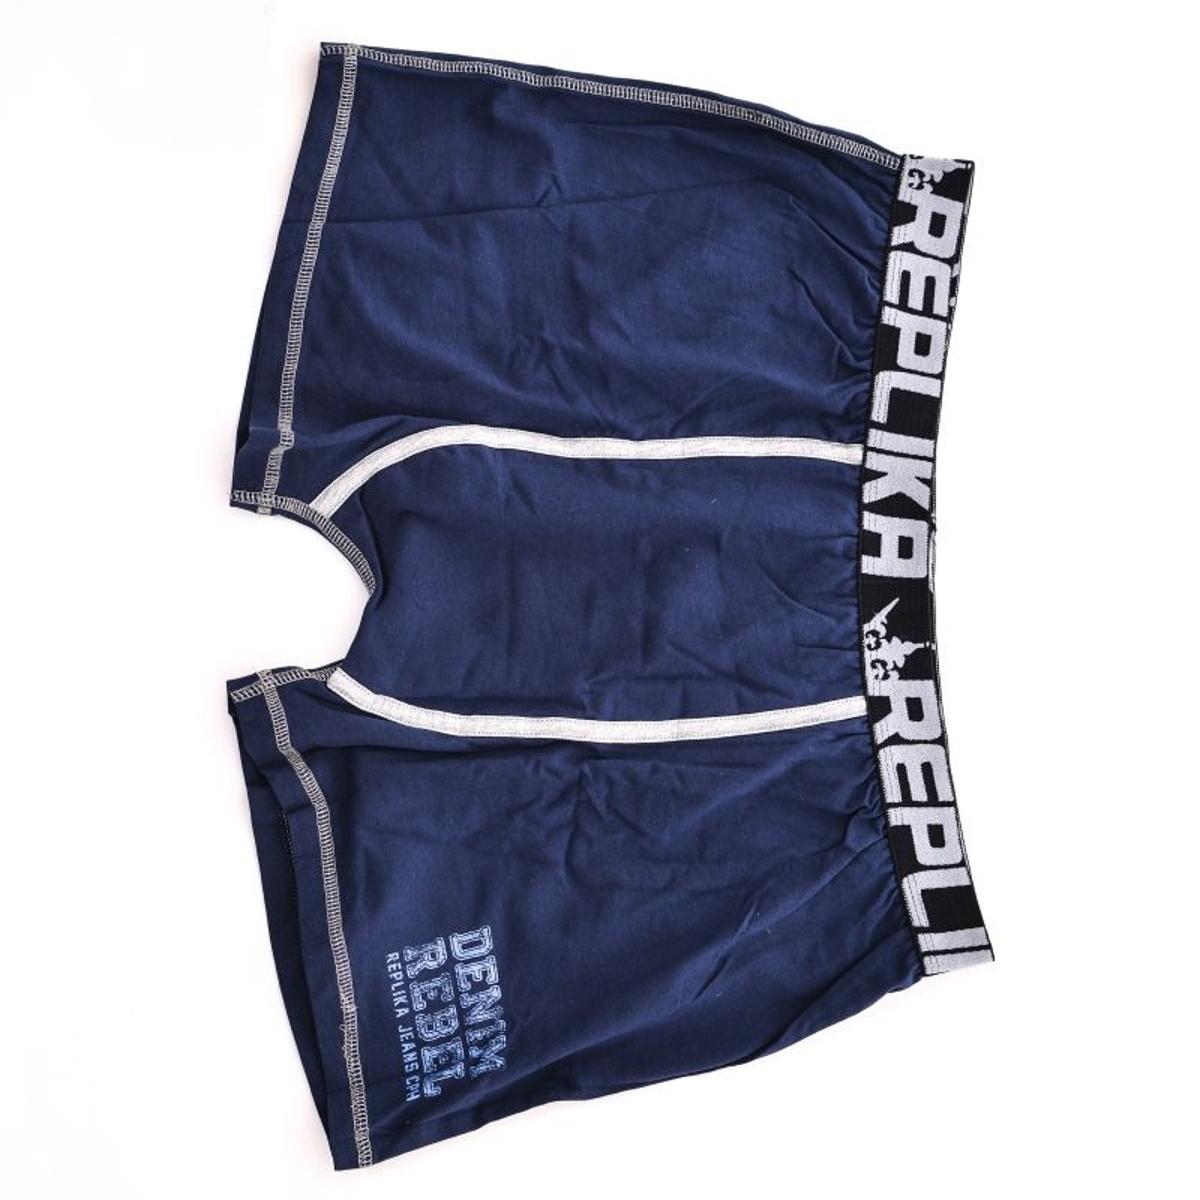 Boxer replika bleu marine